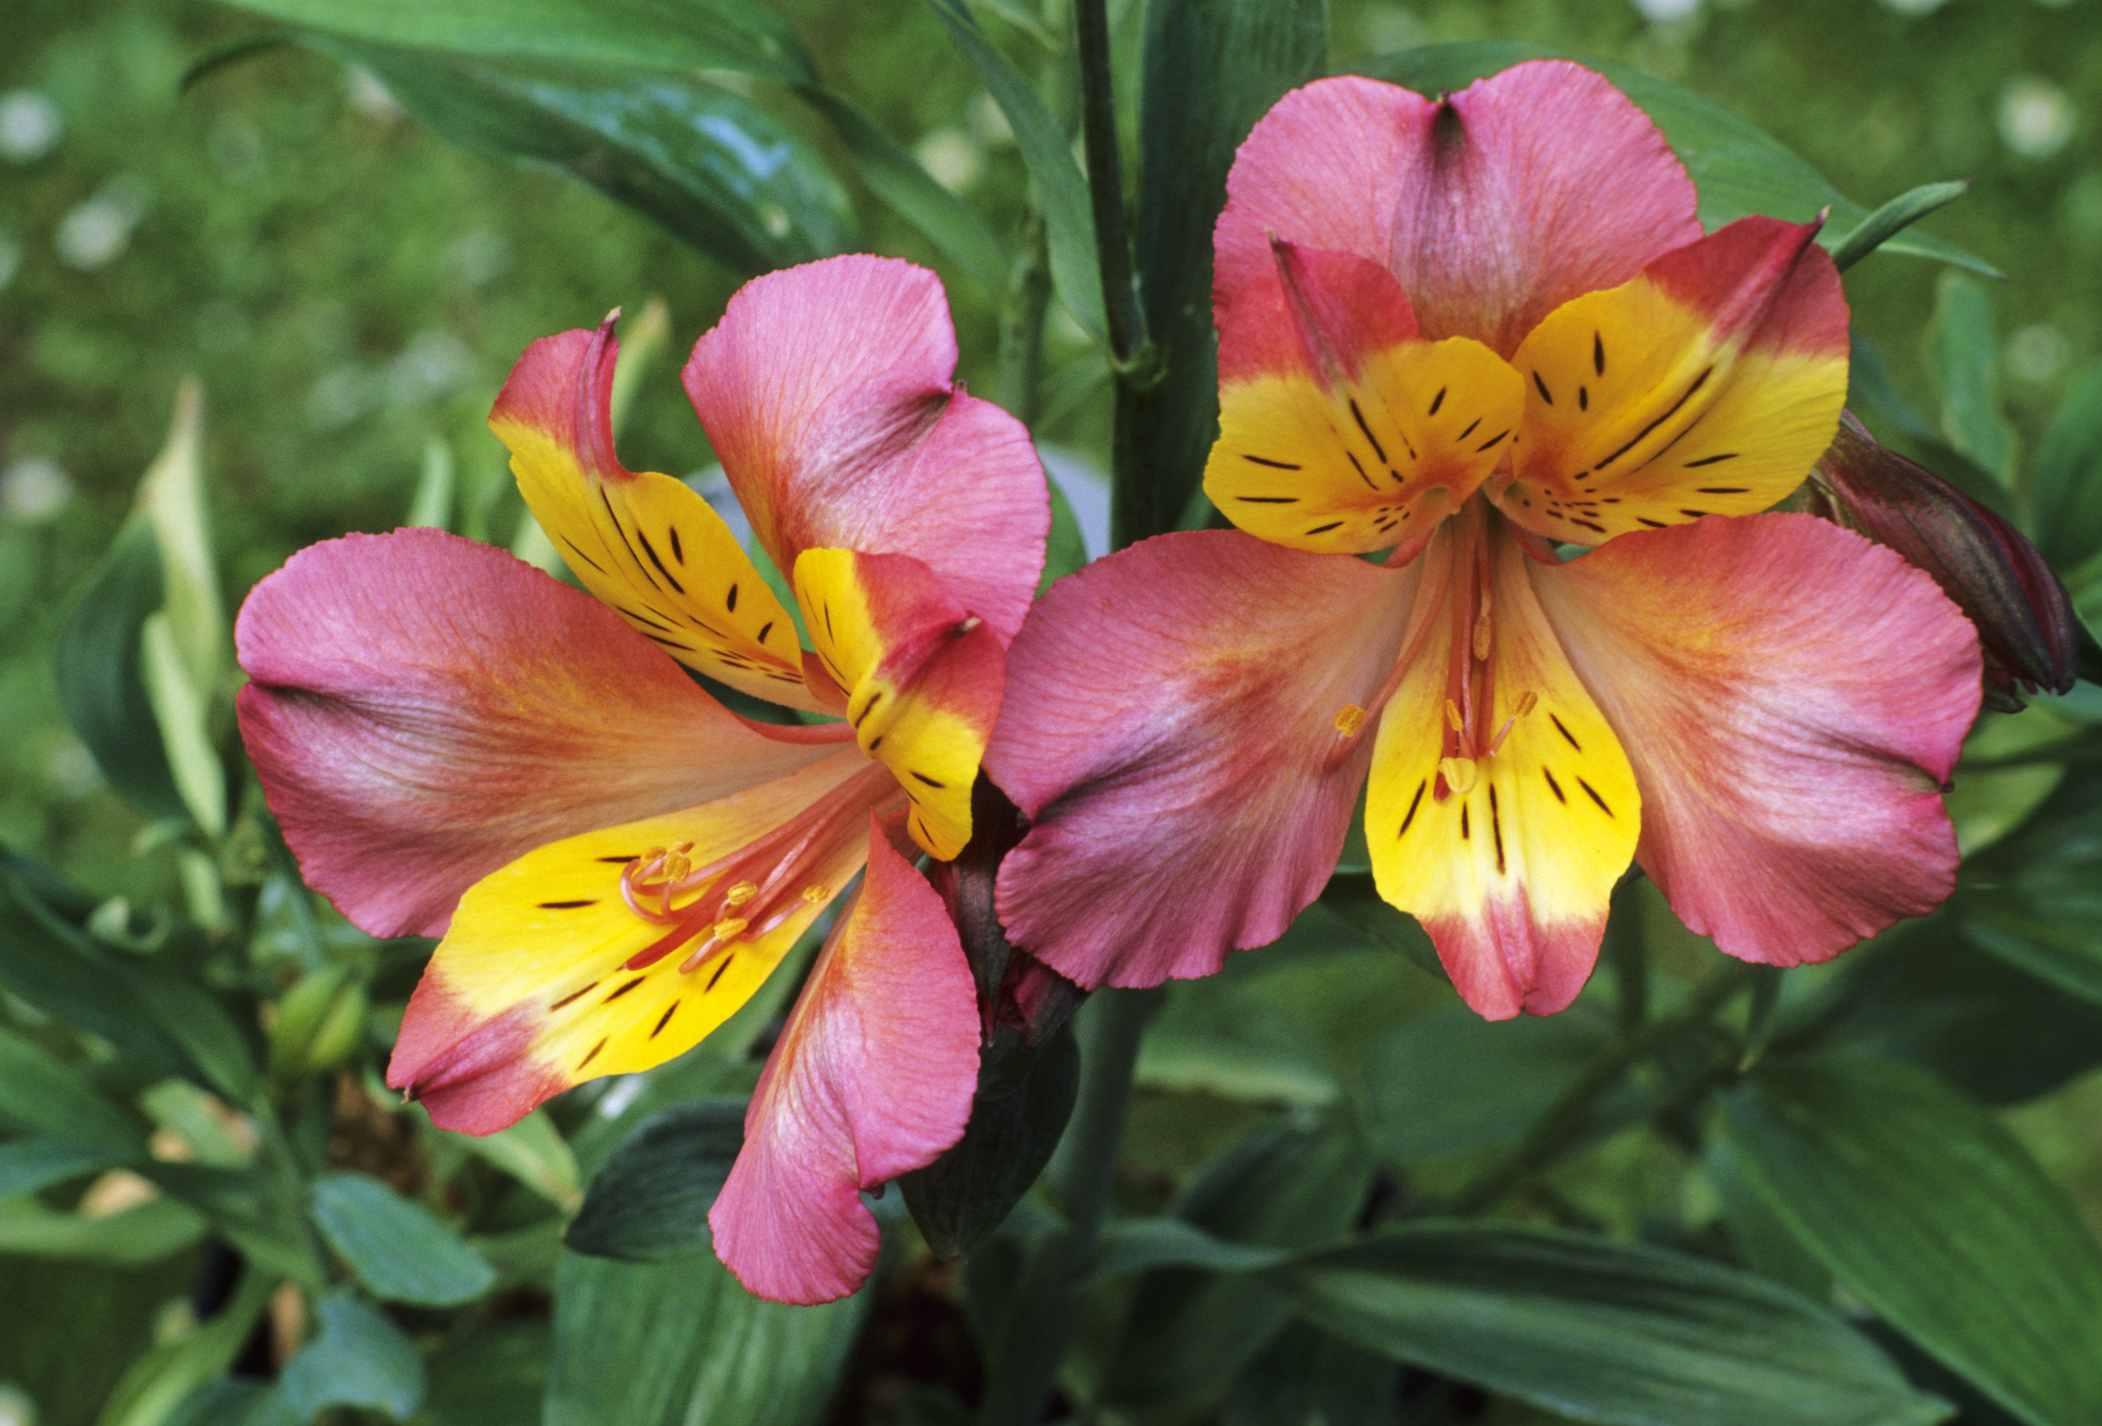 'Alexis' Peruvian Lily